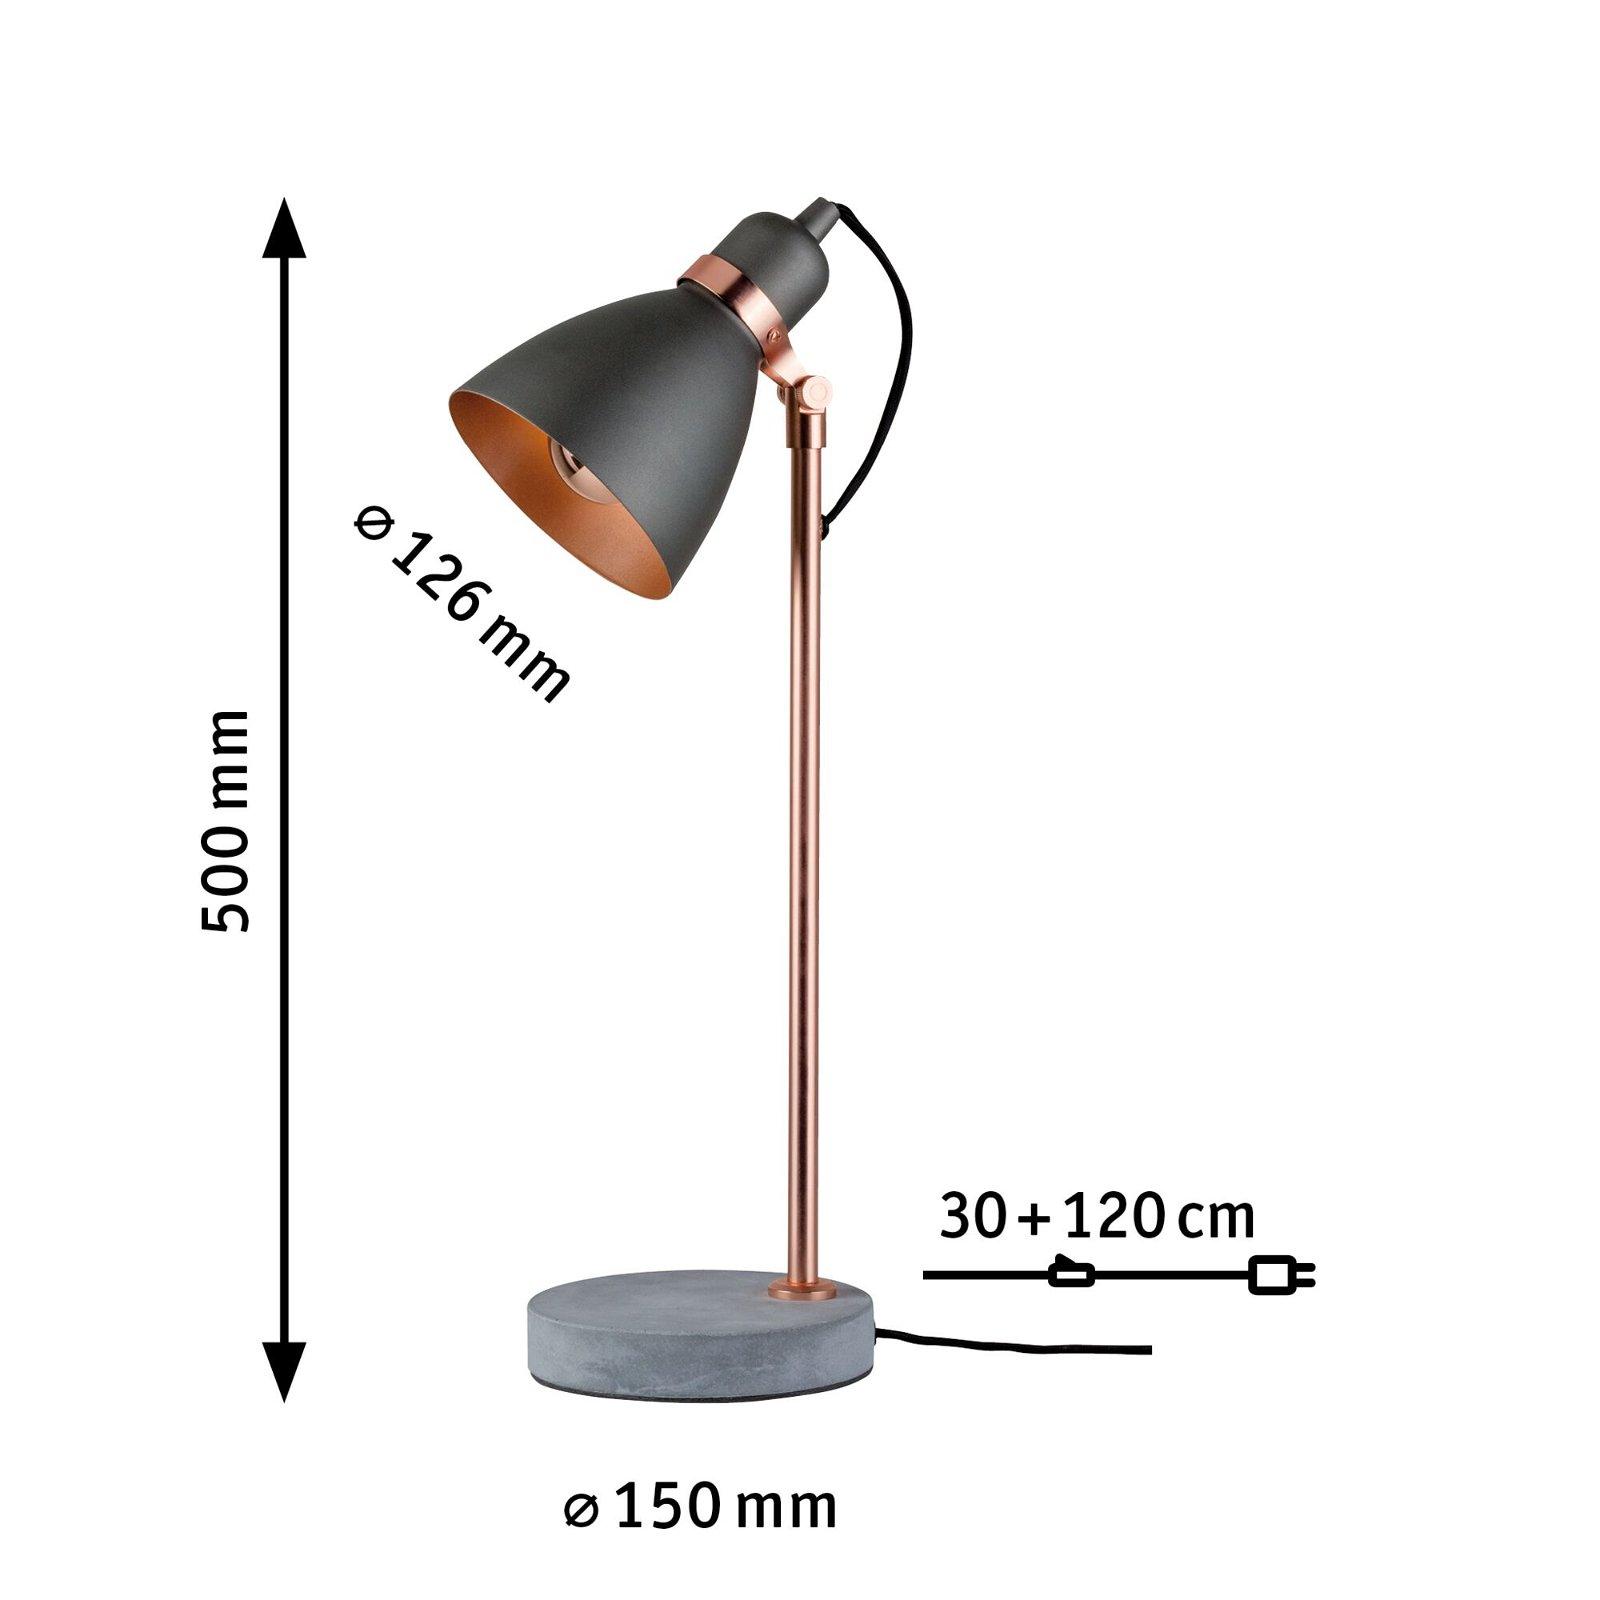 Neordic Tischleuchte Orm E27 max. 20W Grau/Kupfer matt Metall/Beton